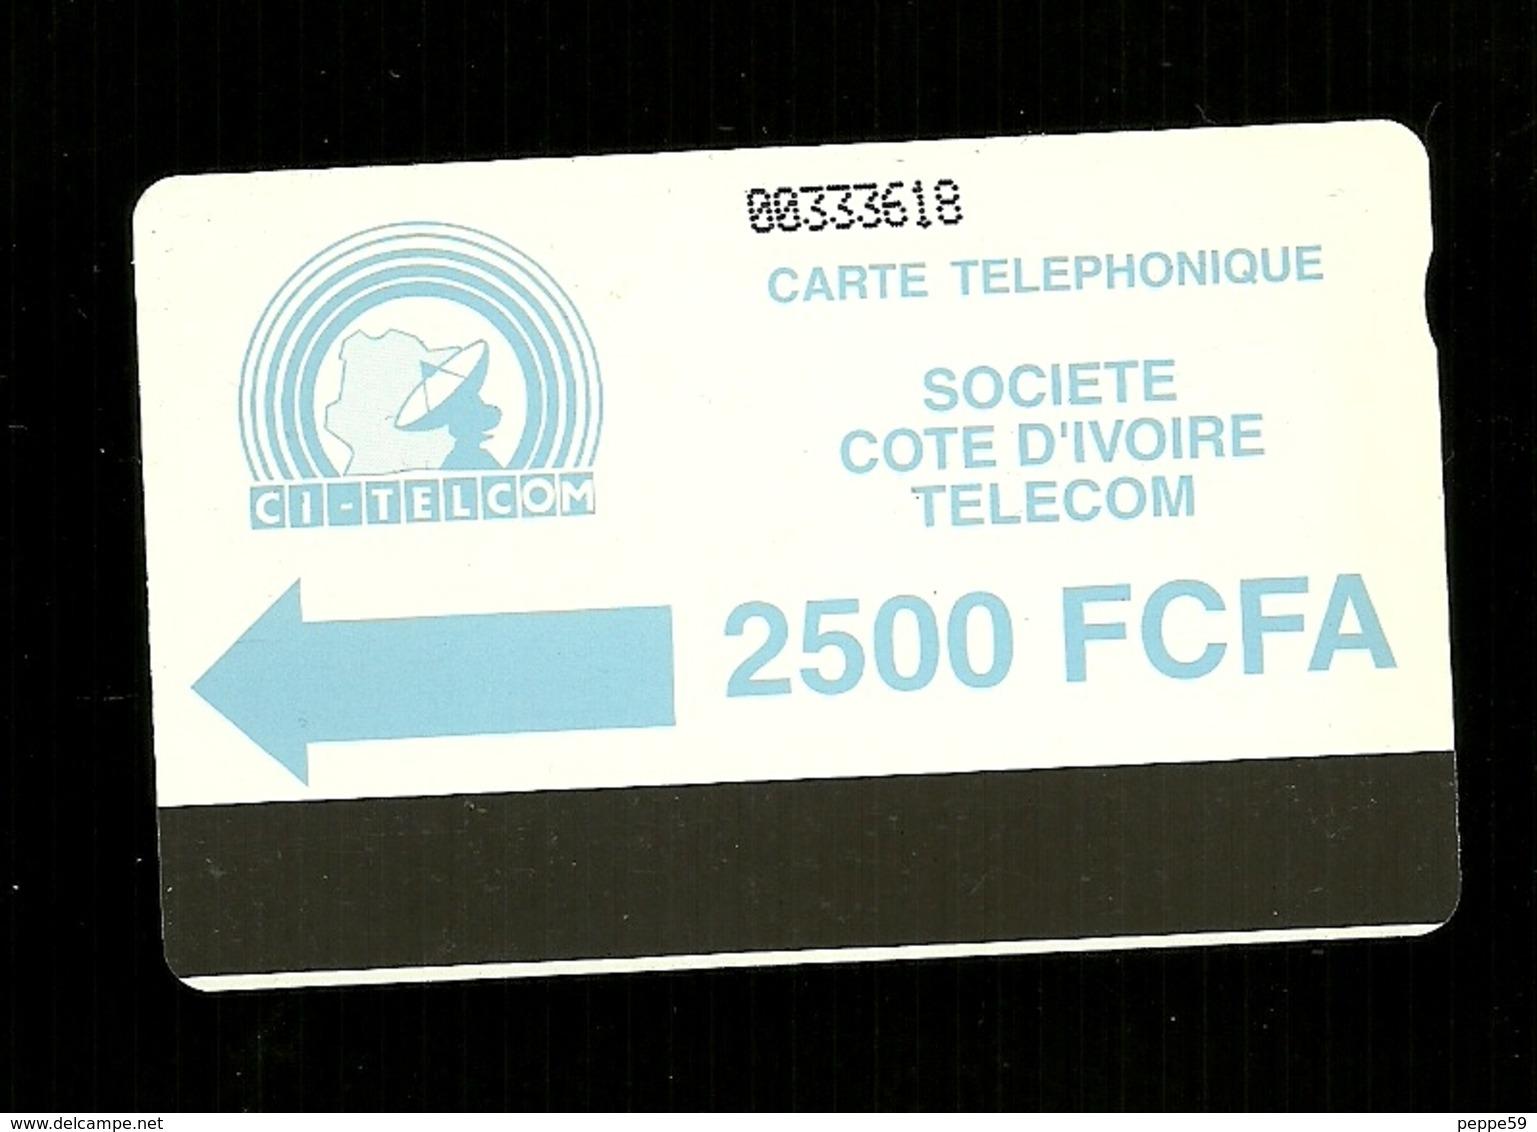 Carta Telefonica Costa D'Avorio - 2500 FCFA  -  Carte Telefoniche@Scheda@Schede@Phonecards@Telecarte@Telefonkarte - Côte D'Ivoire